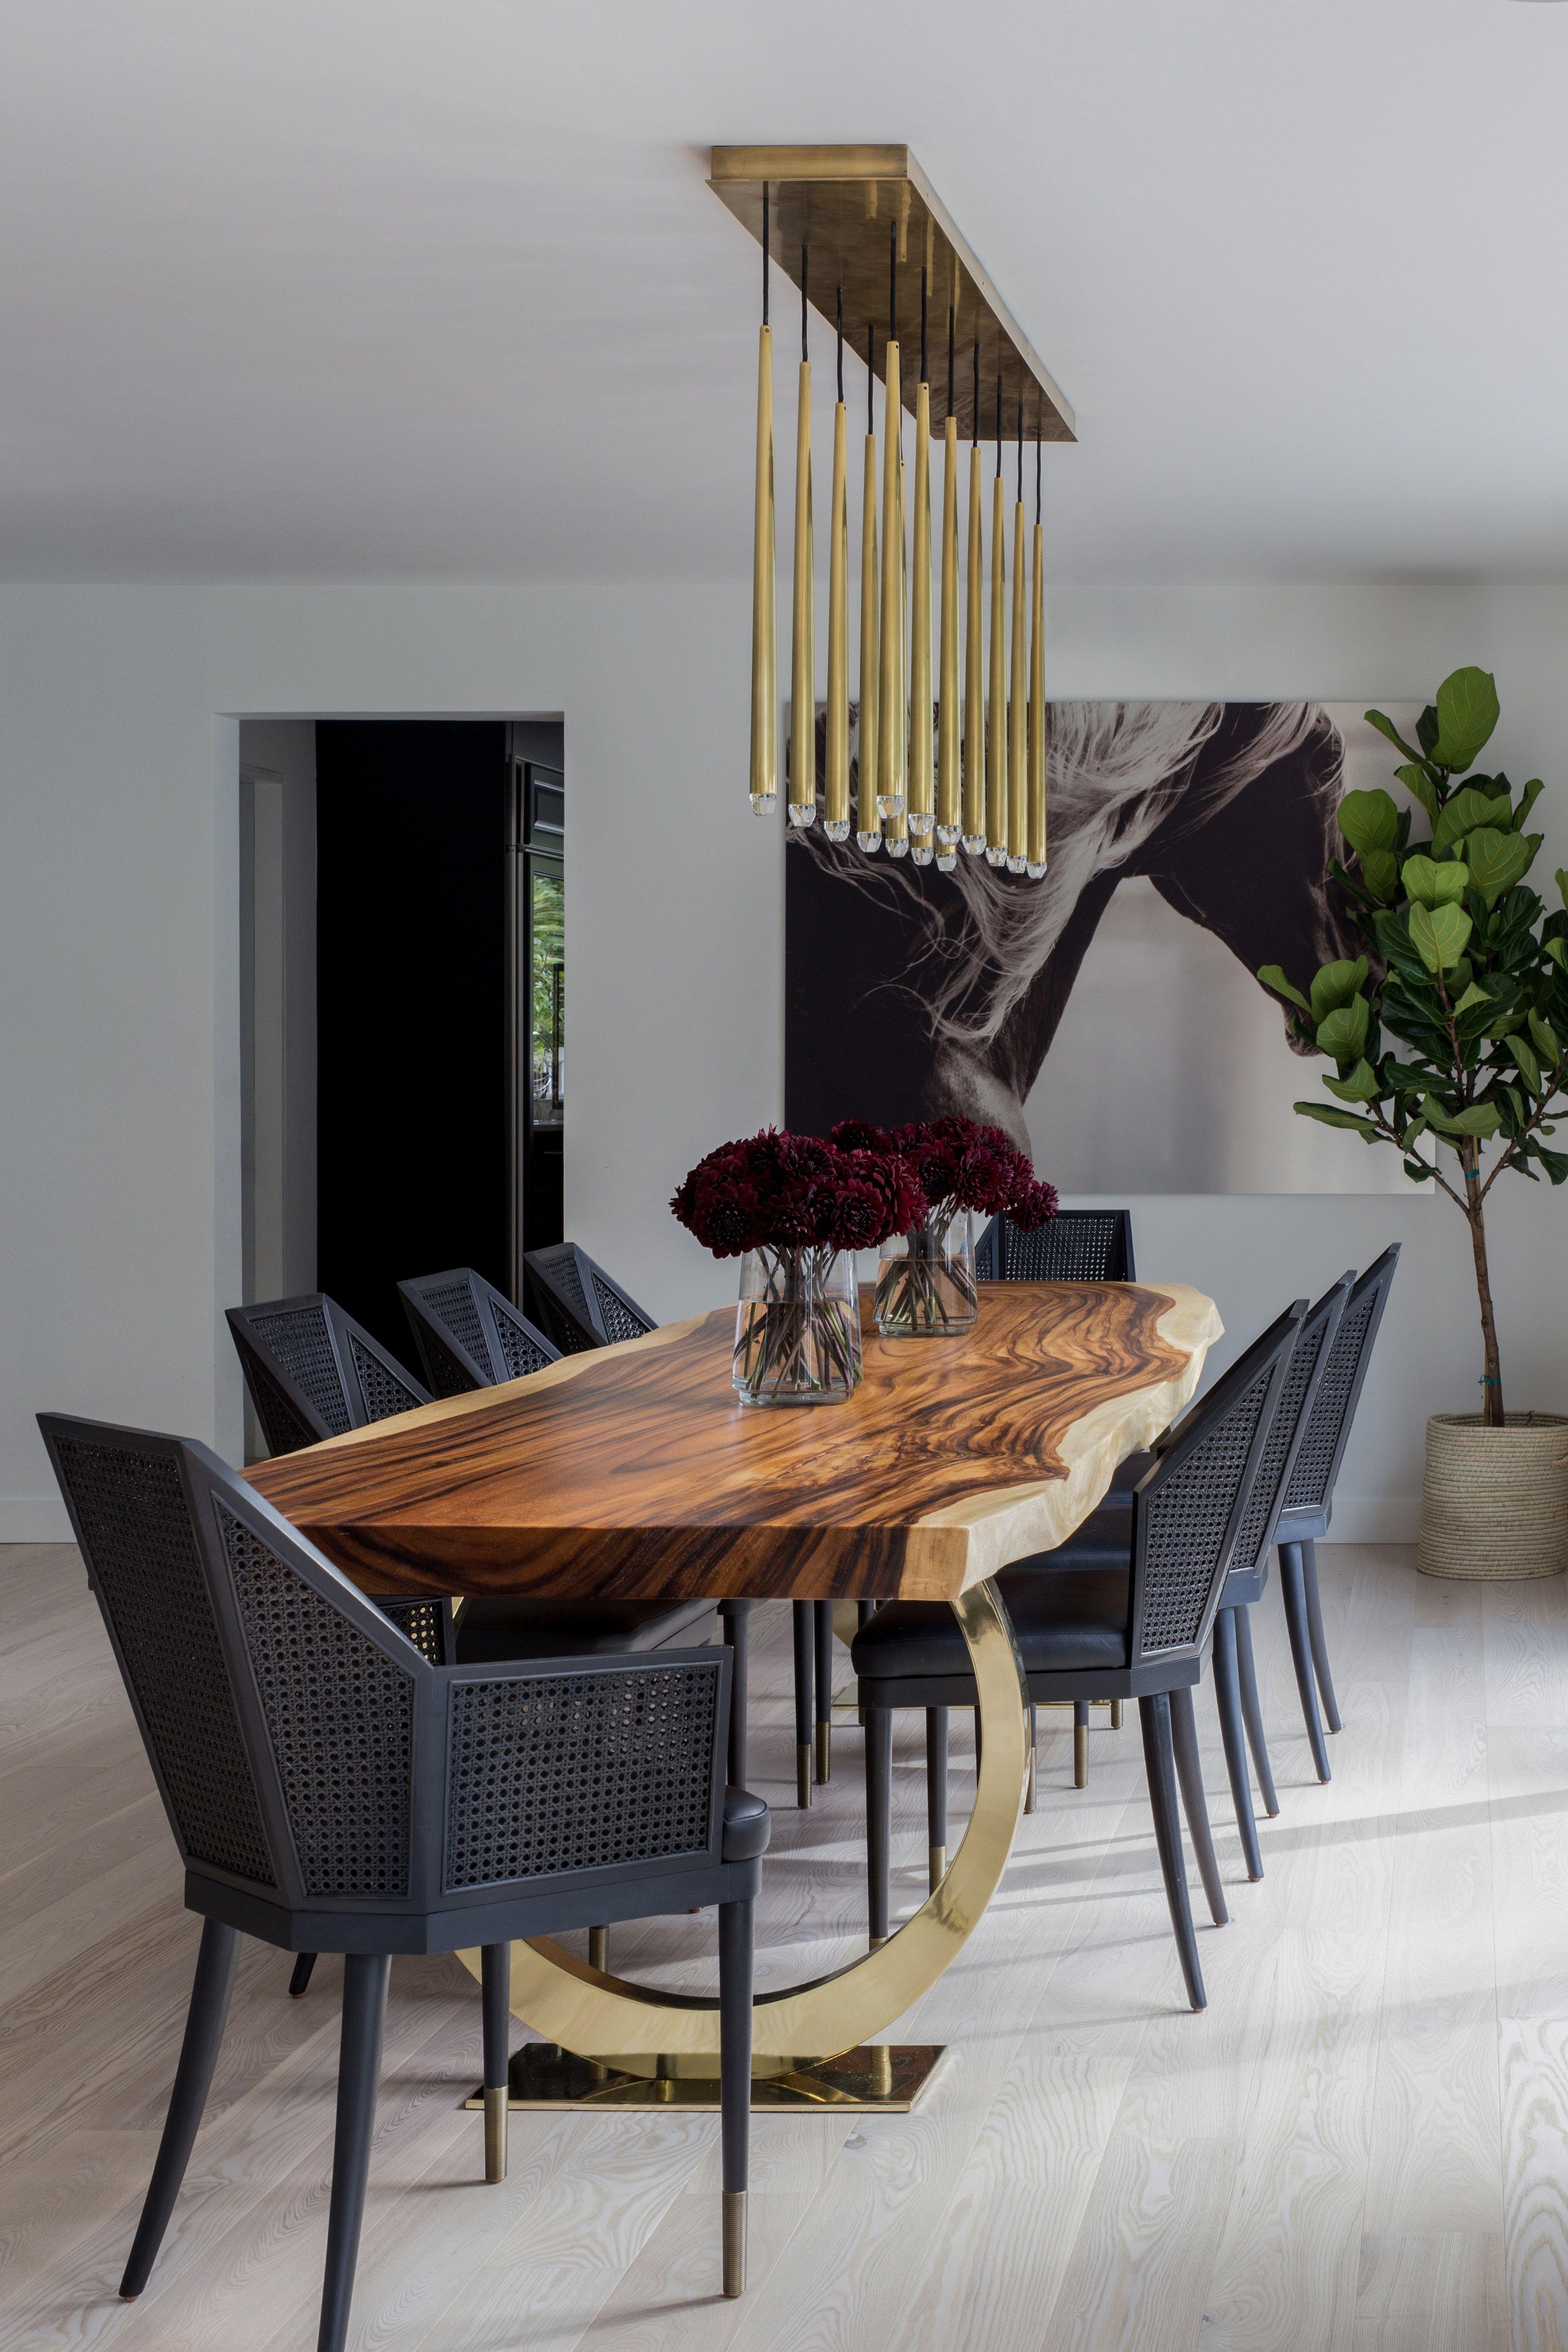 Modern Organic Dining Room With Custom Live Edge Table Organic Dining Room Wooden Dining Room Table Dining Table Design Modern